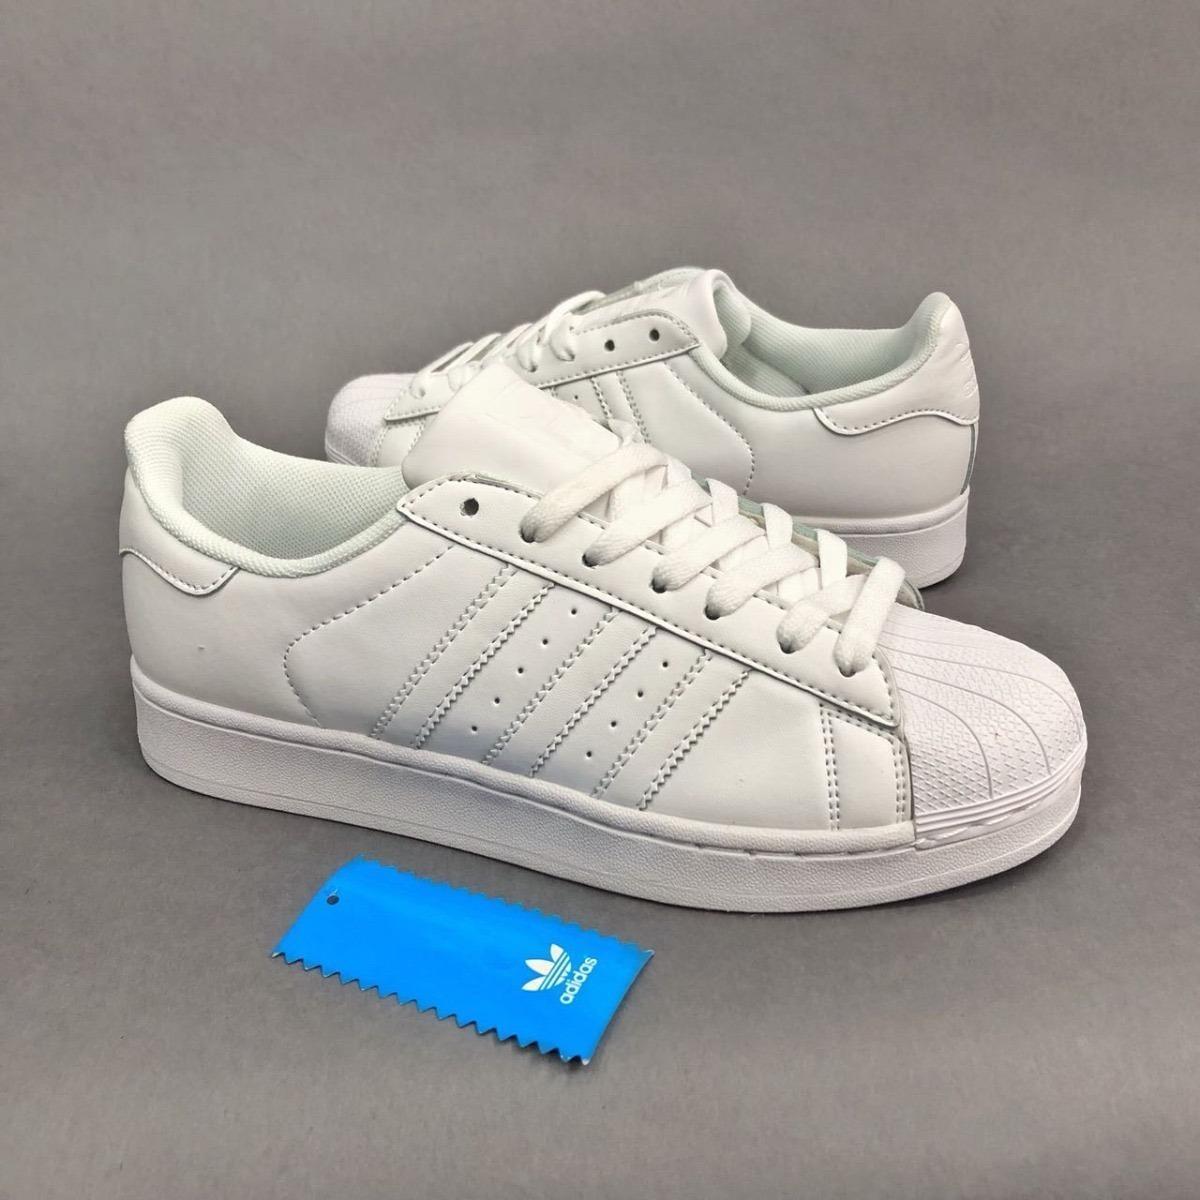 Tenis Zapatillas adidas Superstar Blanca Plateada Mujer -   134.900 ... 65be18a170693